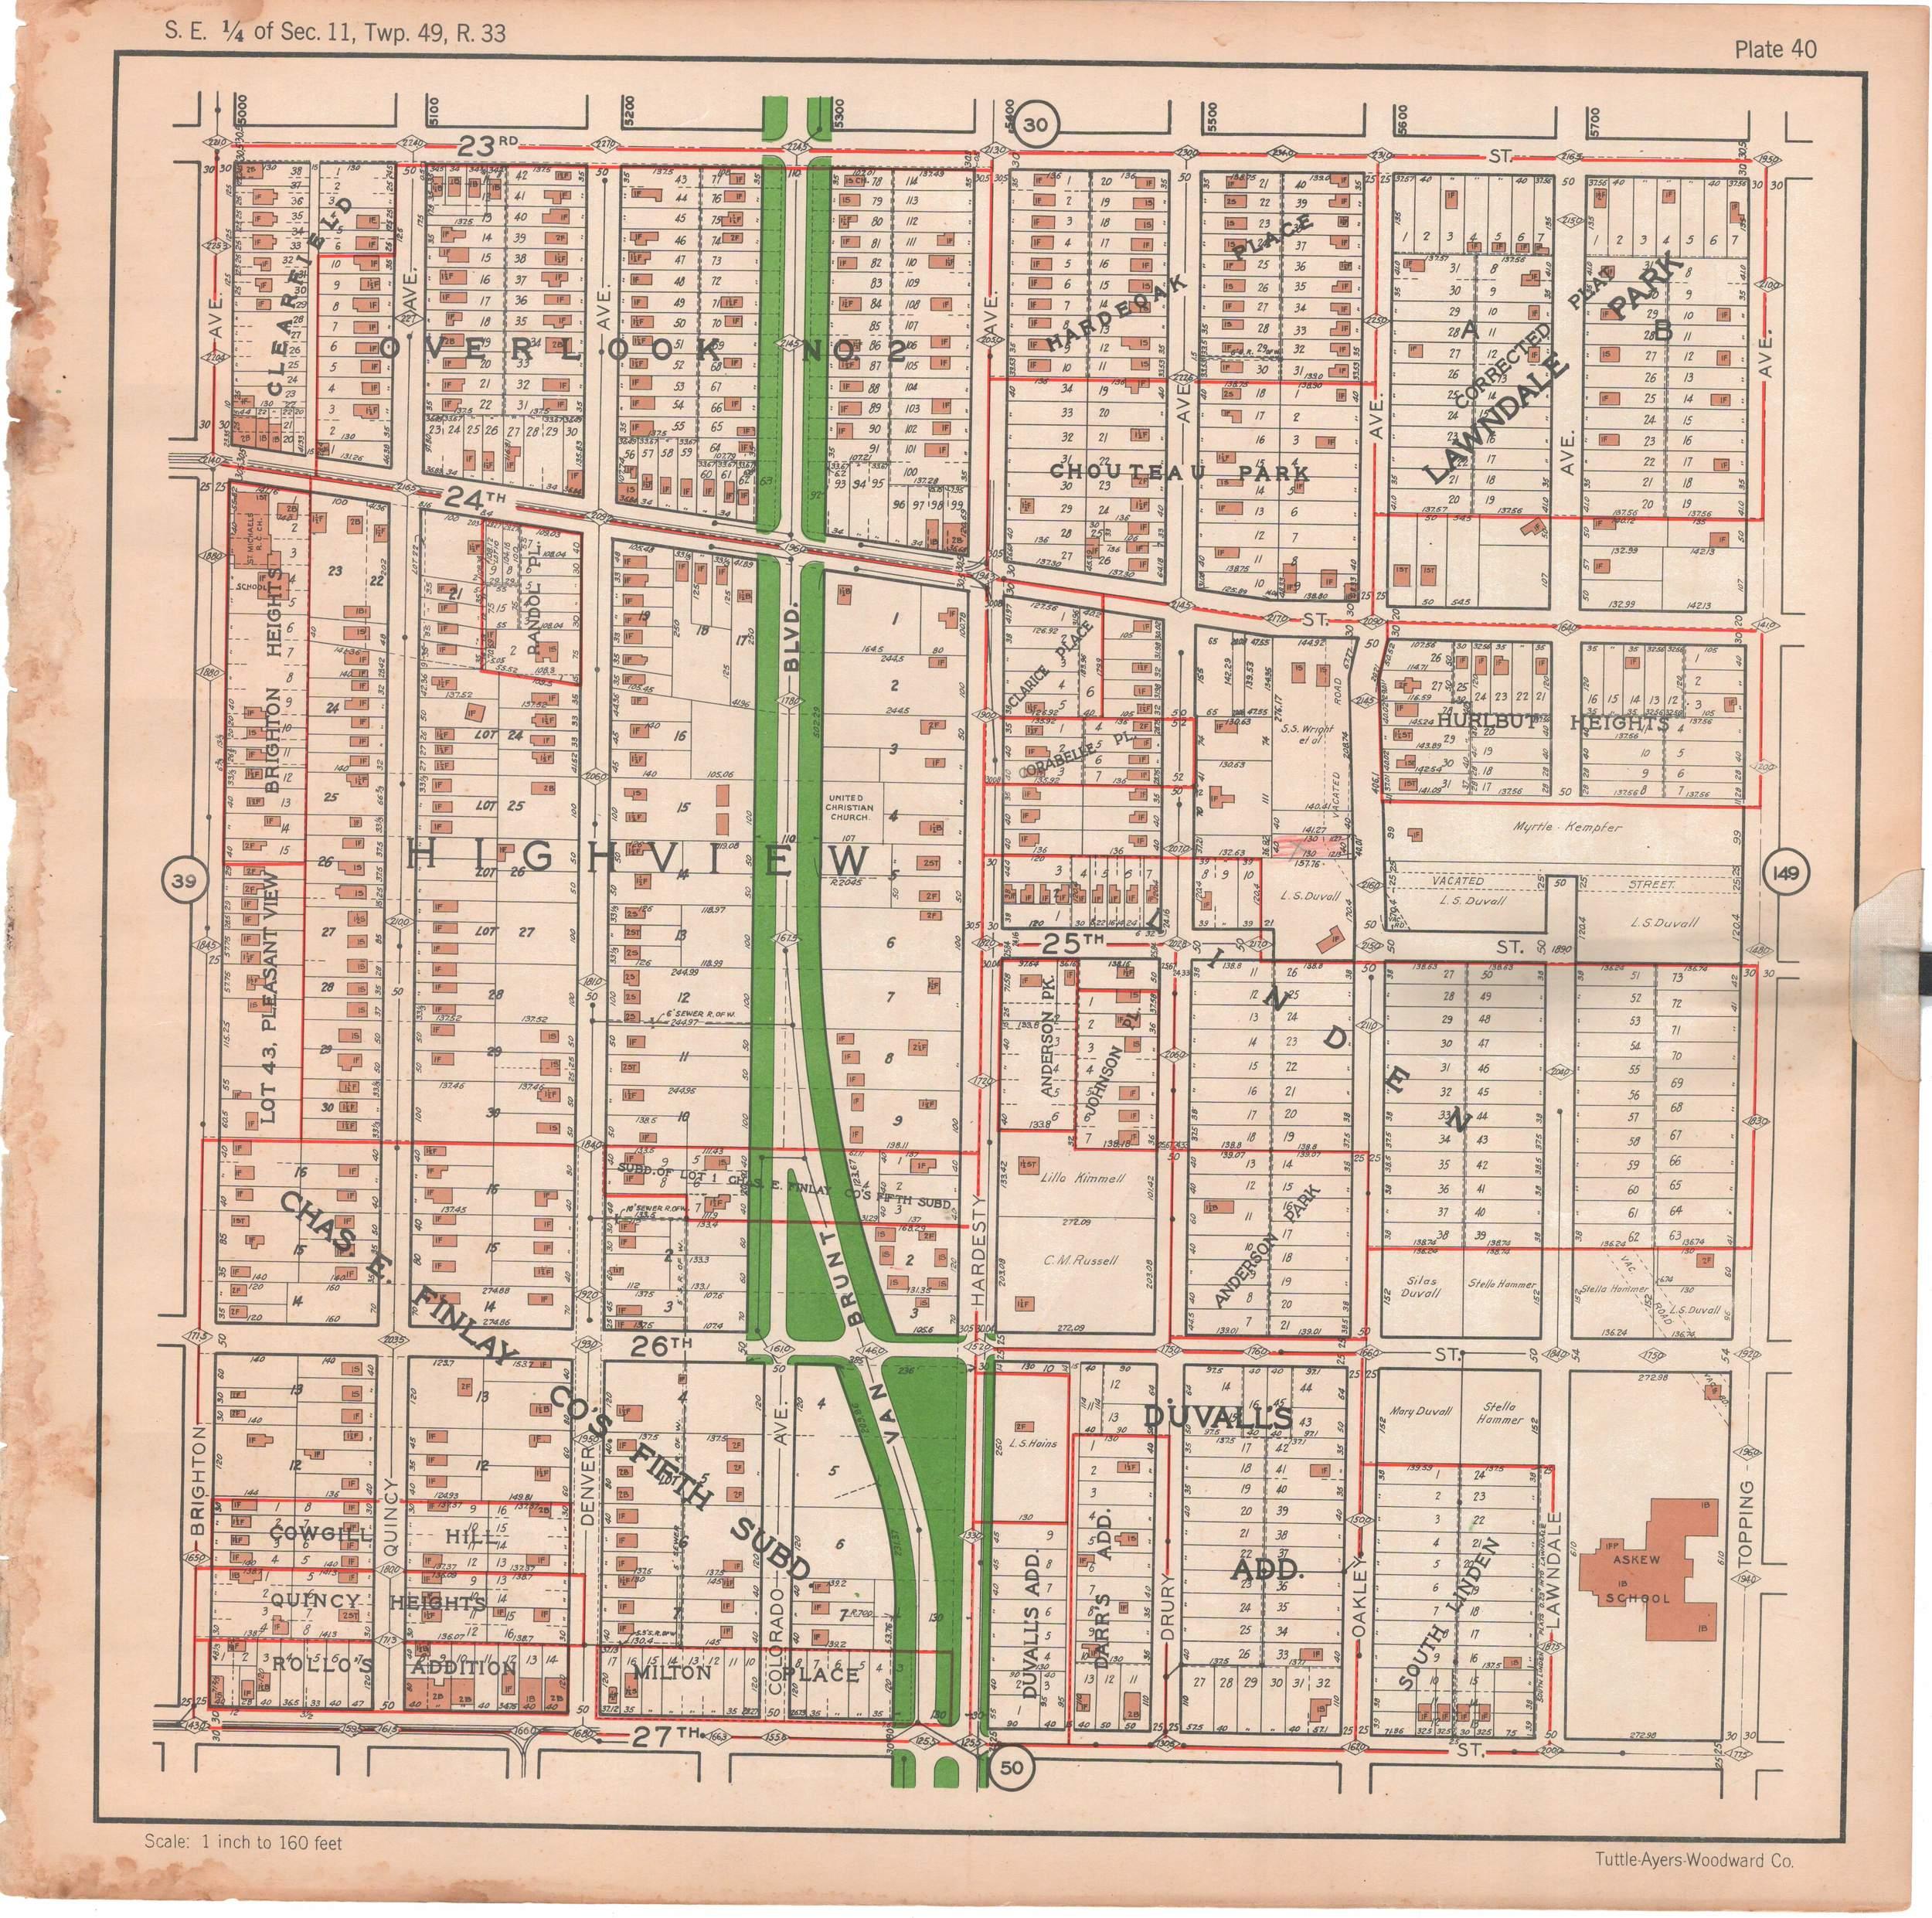 1925 TUTTLE_AYERS_Plate 40.JPG